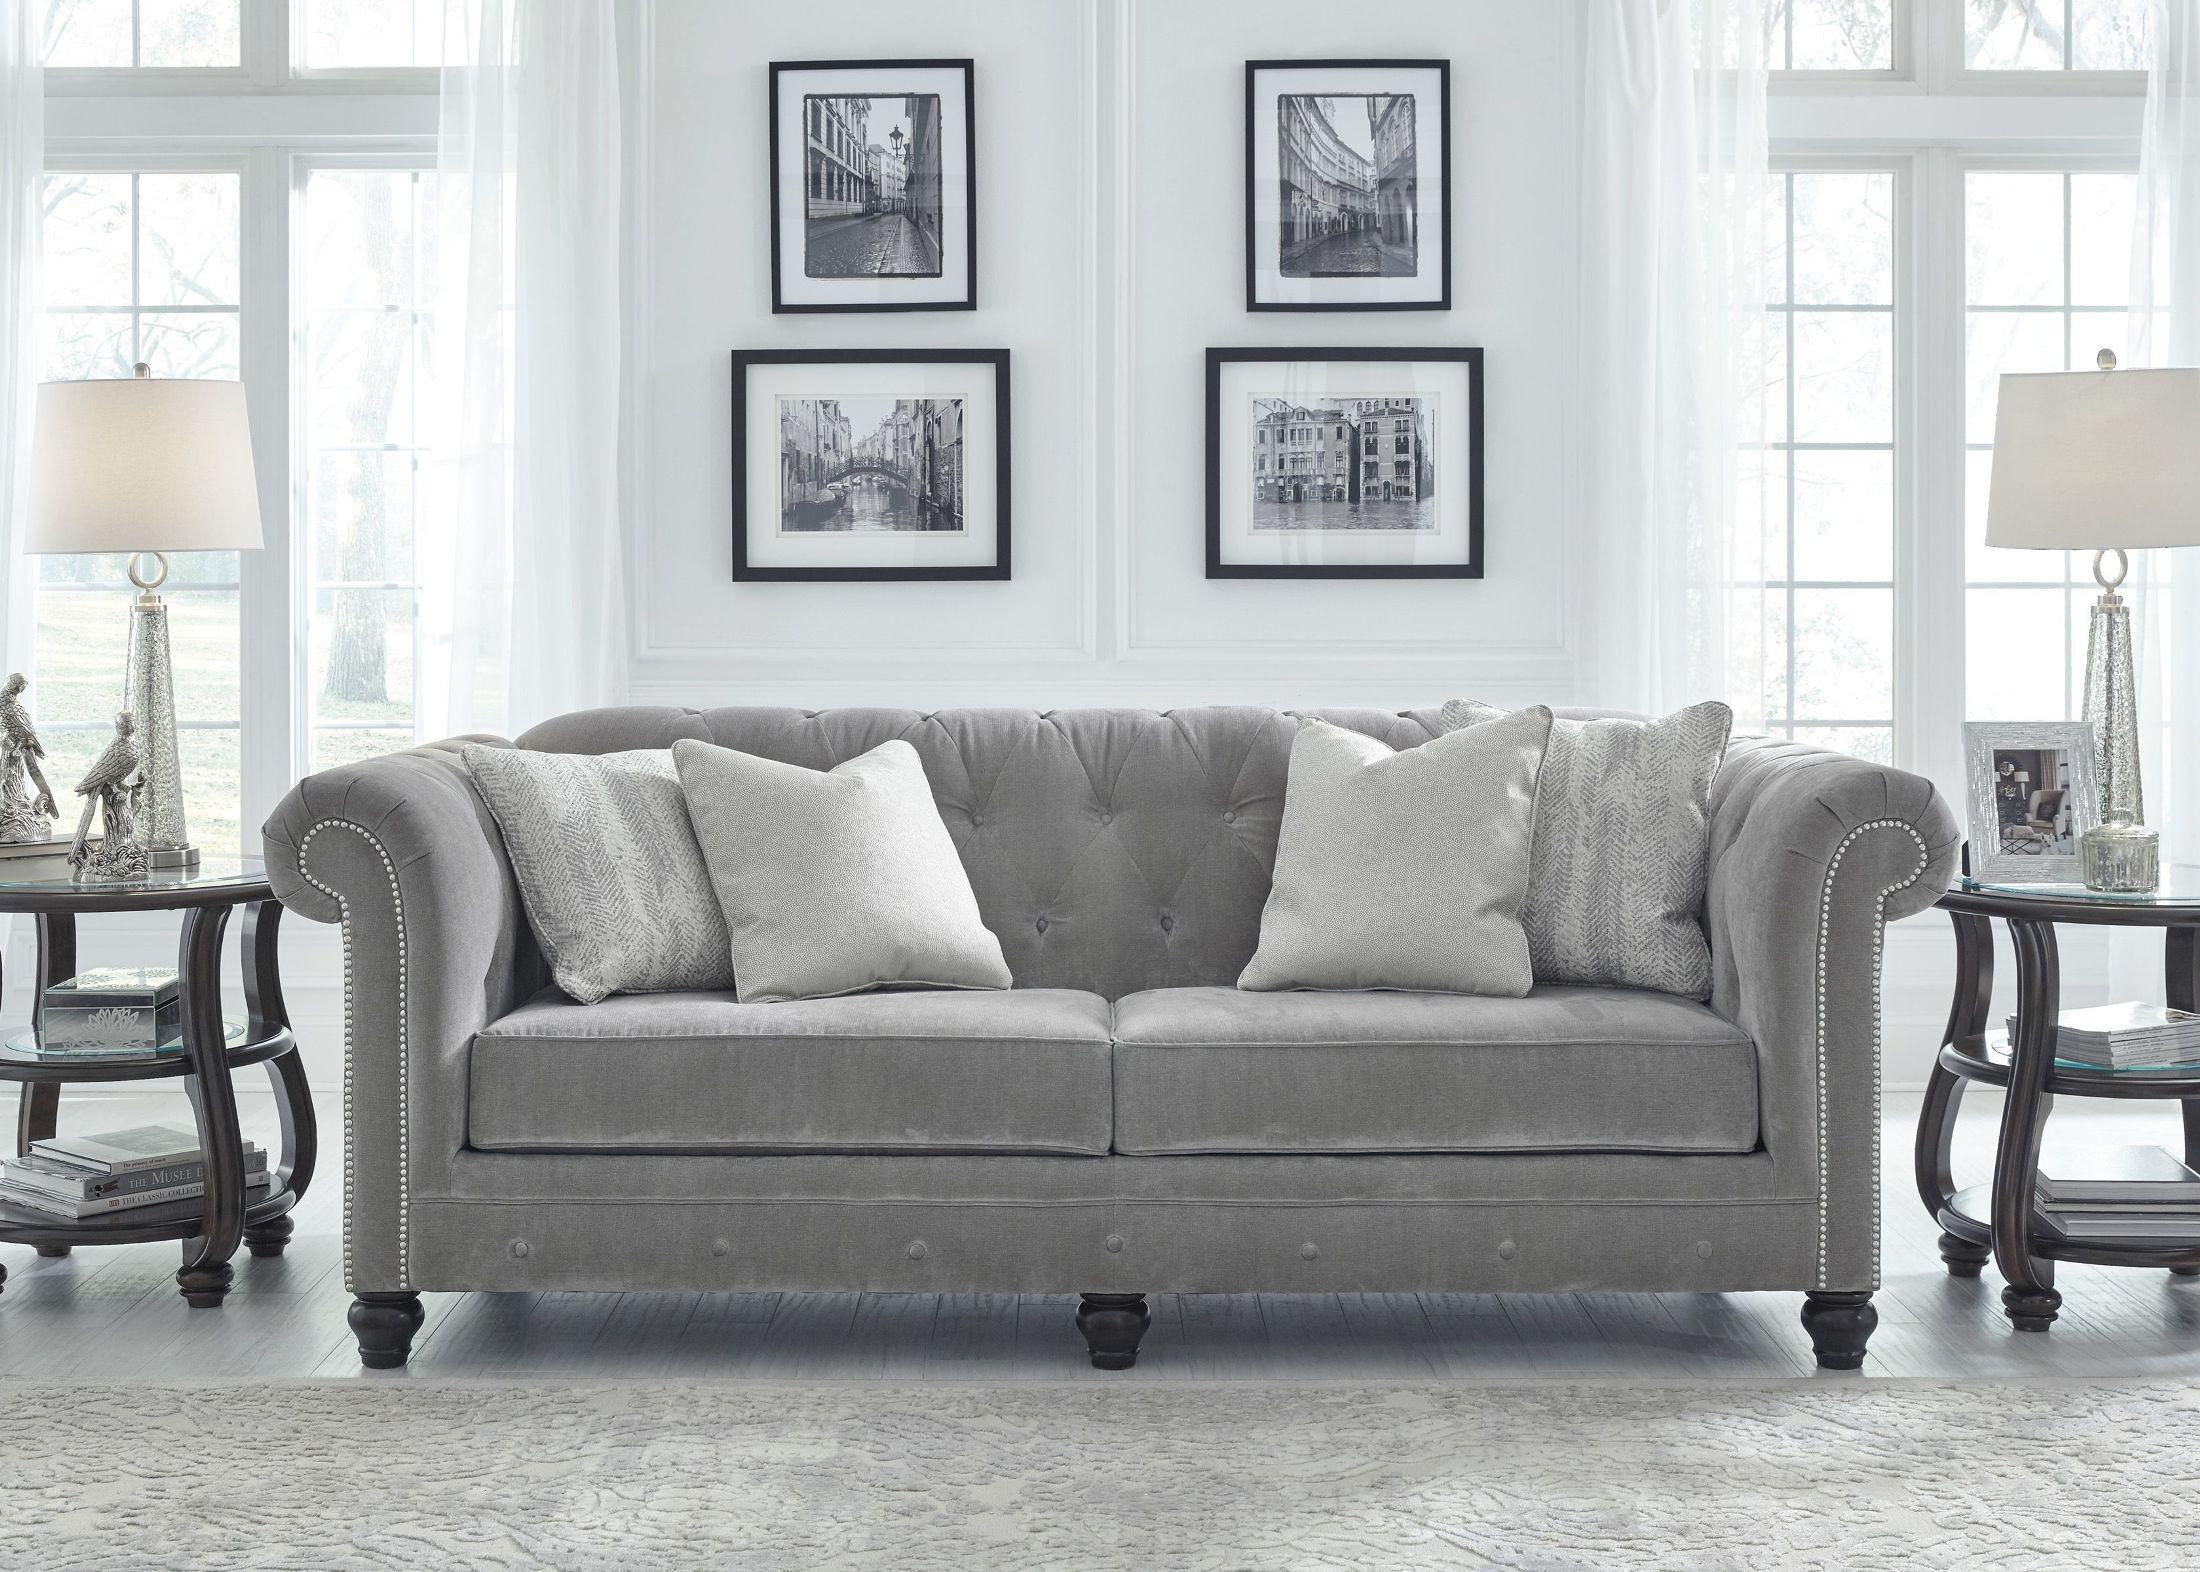 Tiarella Ash Sofa From Ashley Coleman Furniture